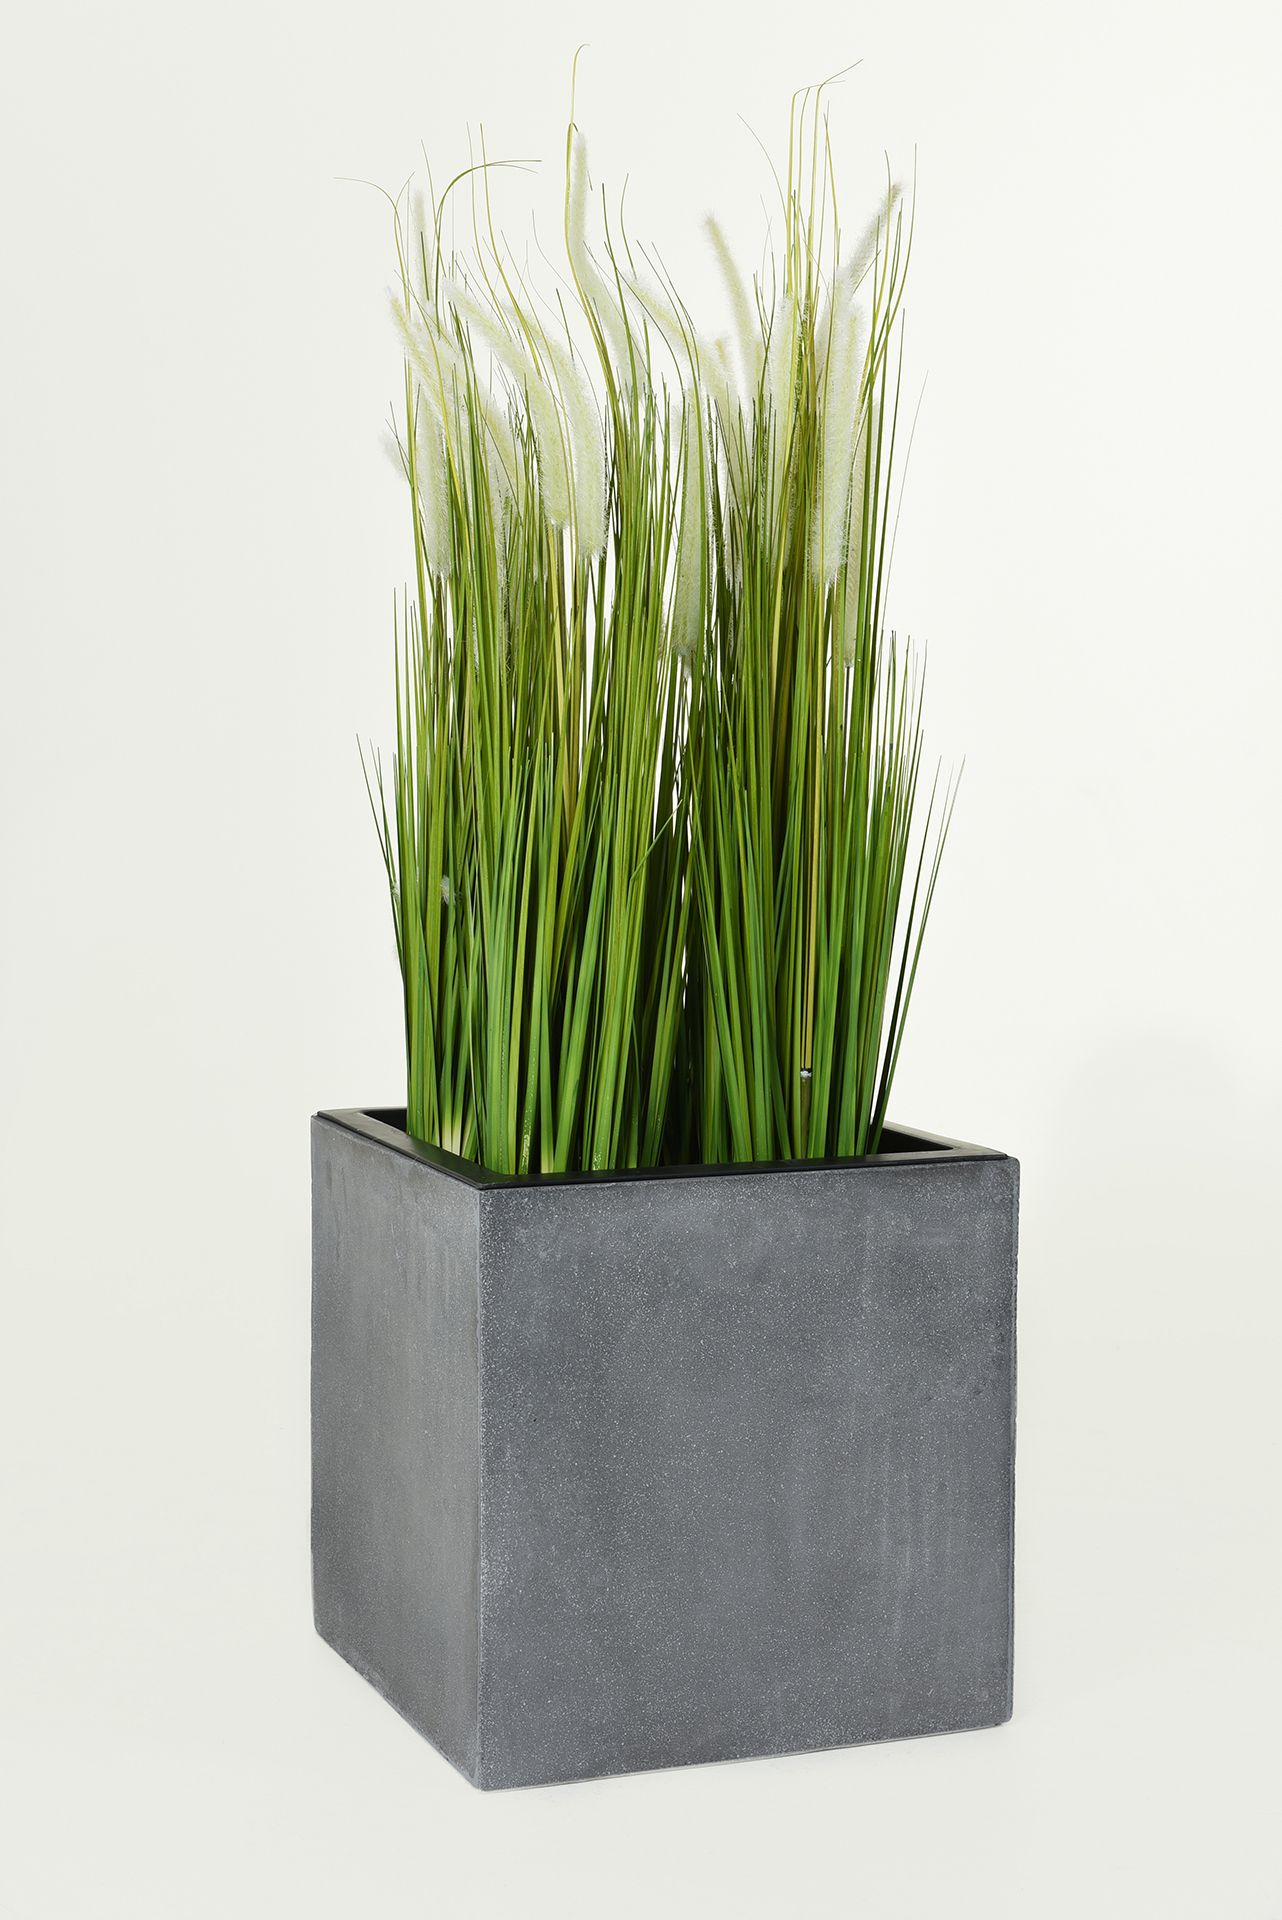 pflanzk bel blumenk bel block 50x50x50cm beton anthrazit b ware ts 977 ebay. Black Bedroom Furniture Sets. Home Design Ideas